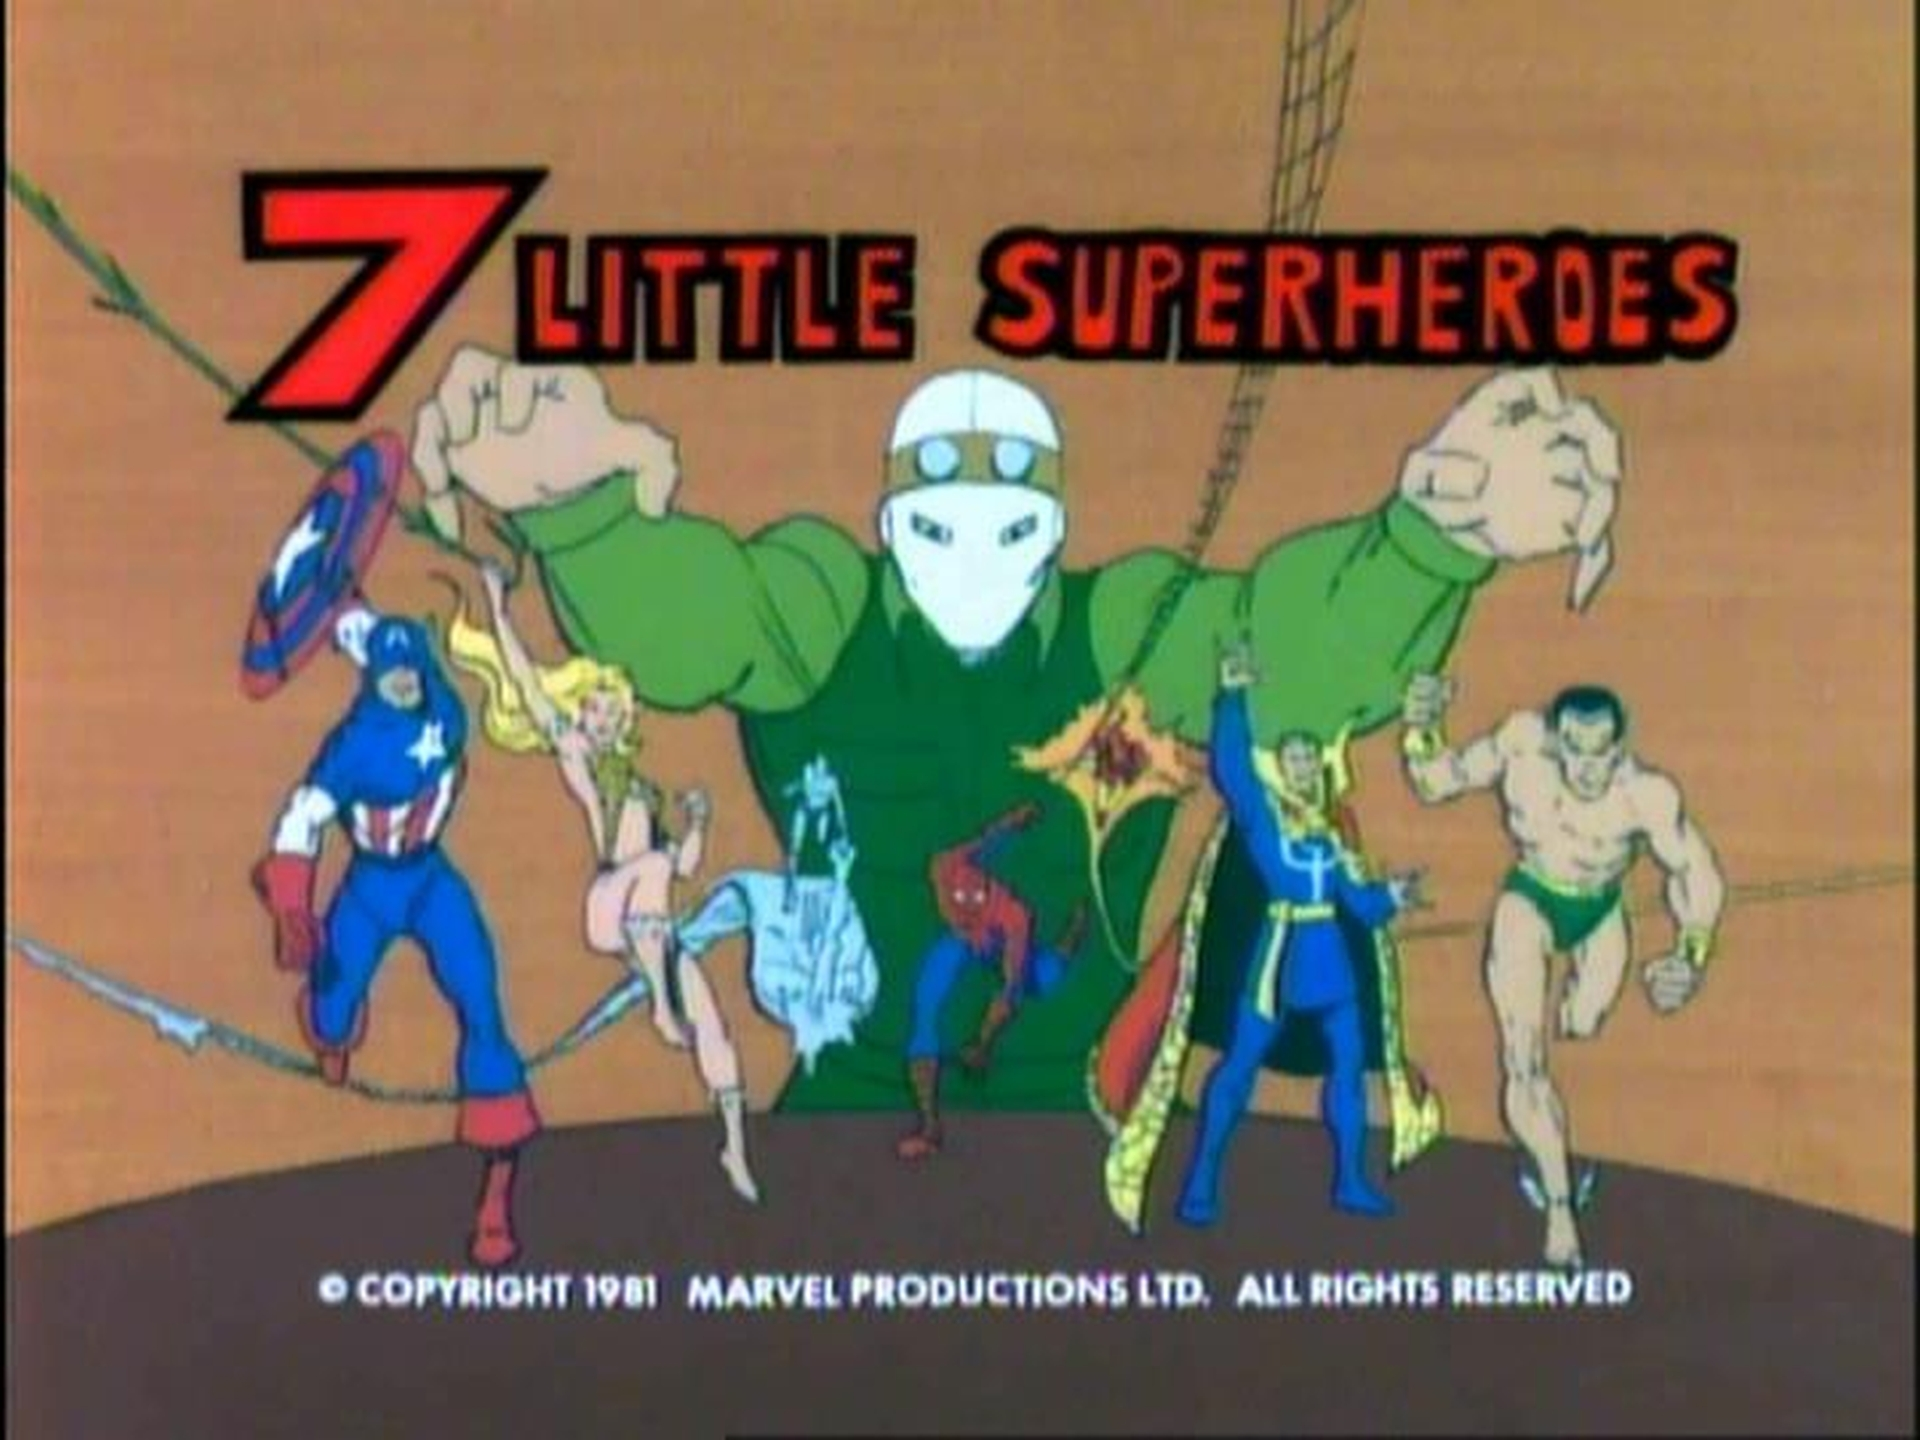 7 Little Superheroes